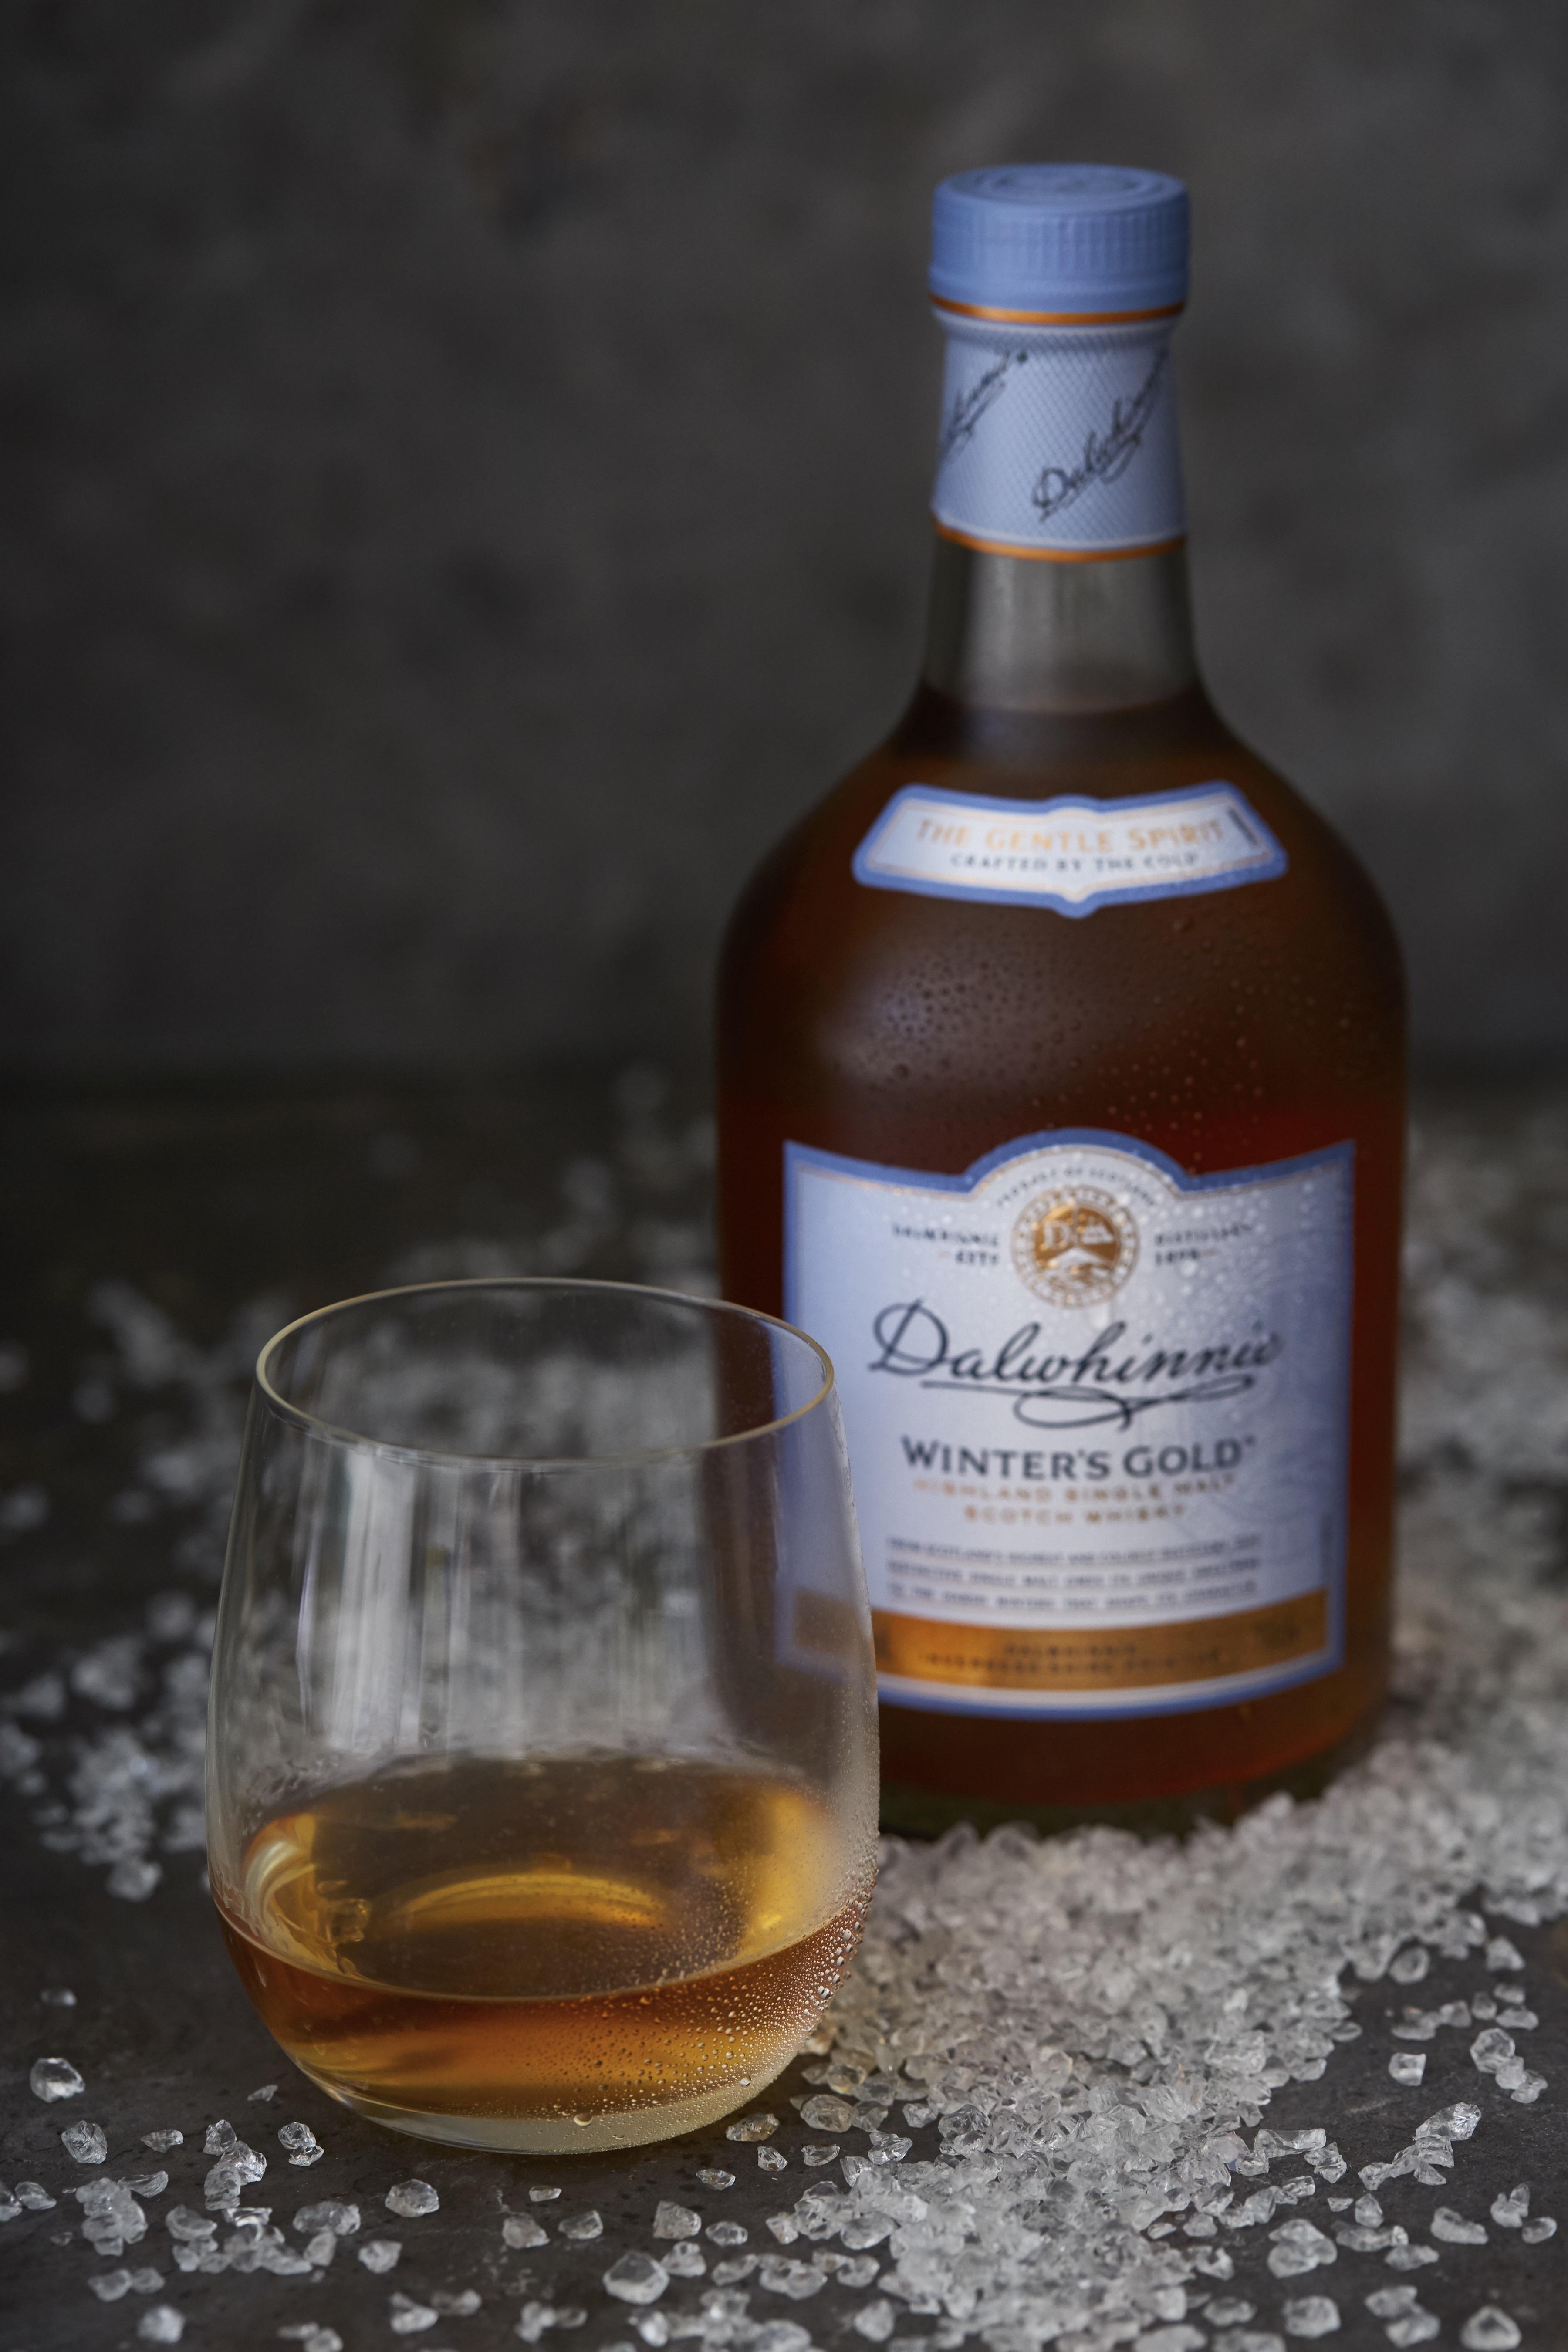 Dalwhinnie Winter's Gold – single malt scotch